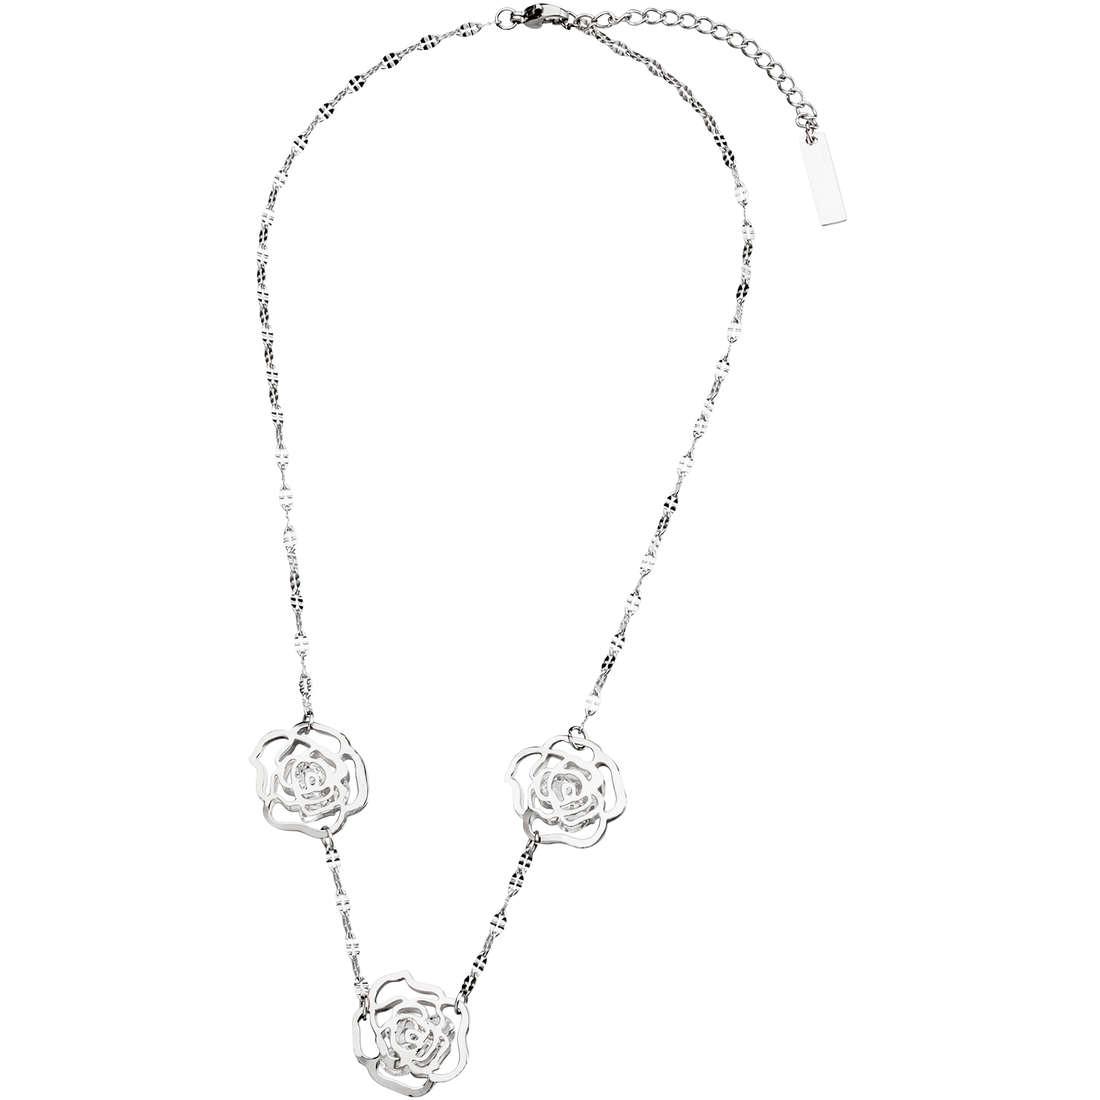 collana donna gioielli Marlù Woman Chic 2CO0041